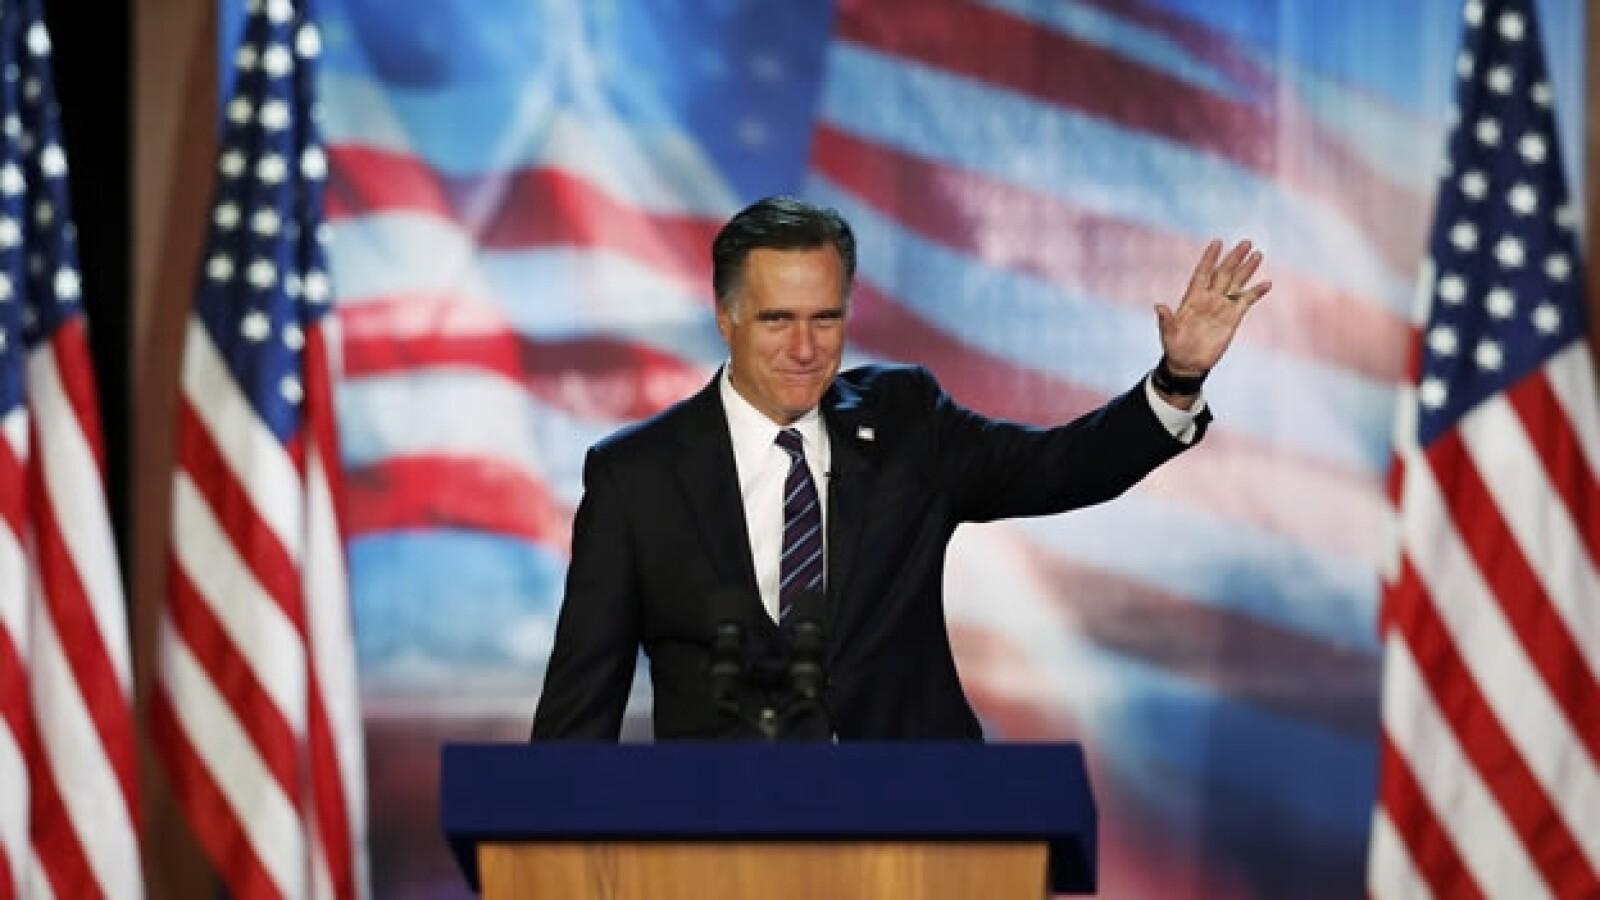 mitt romney discurso derrota elecciones